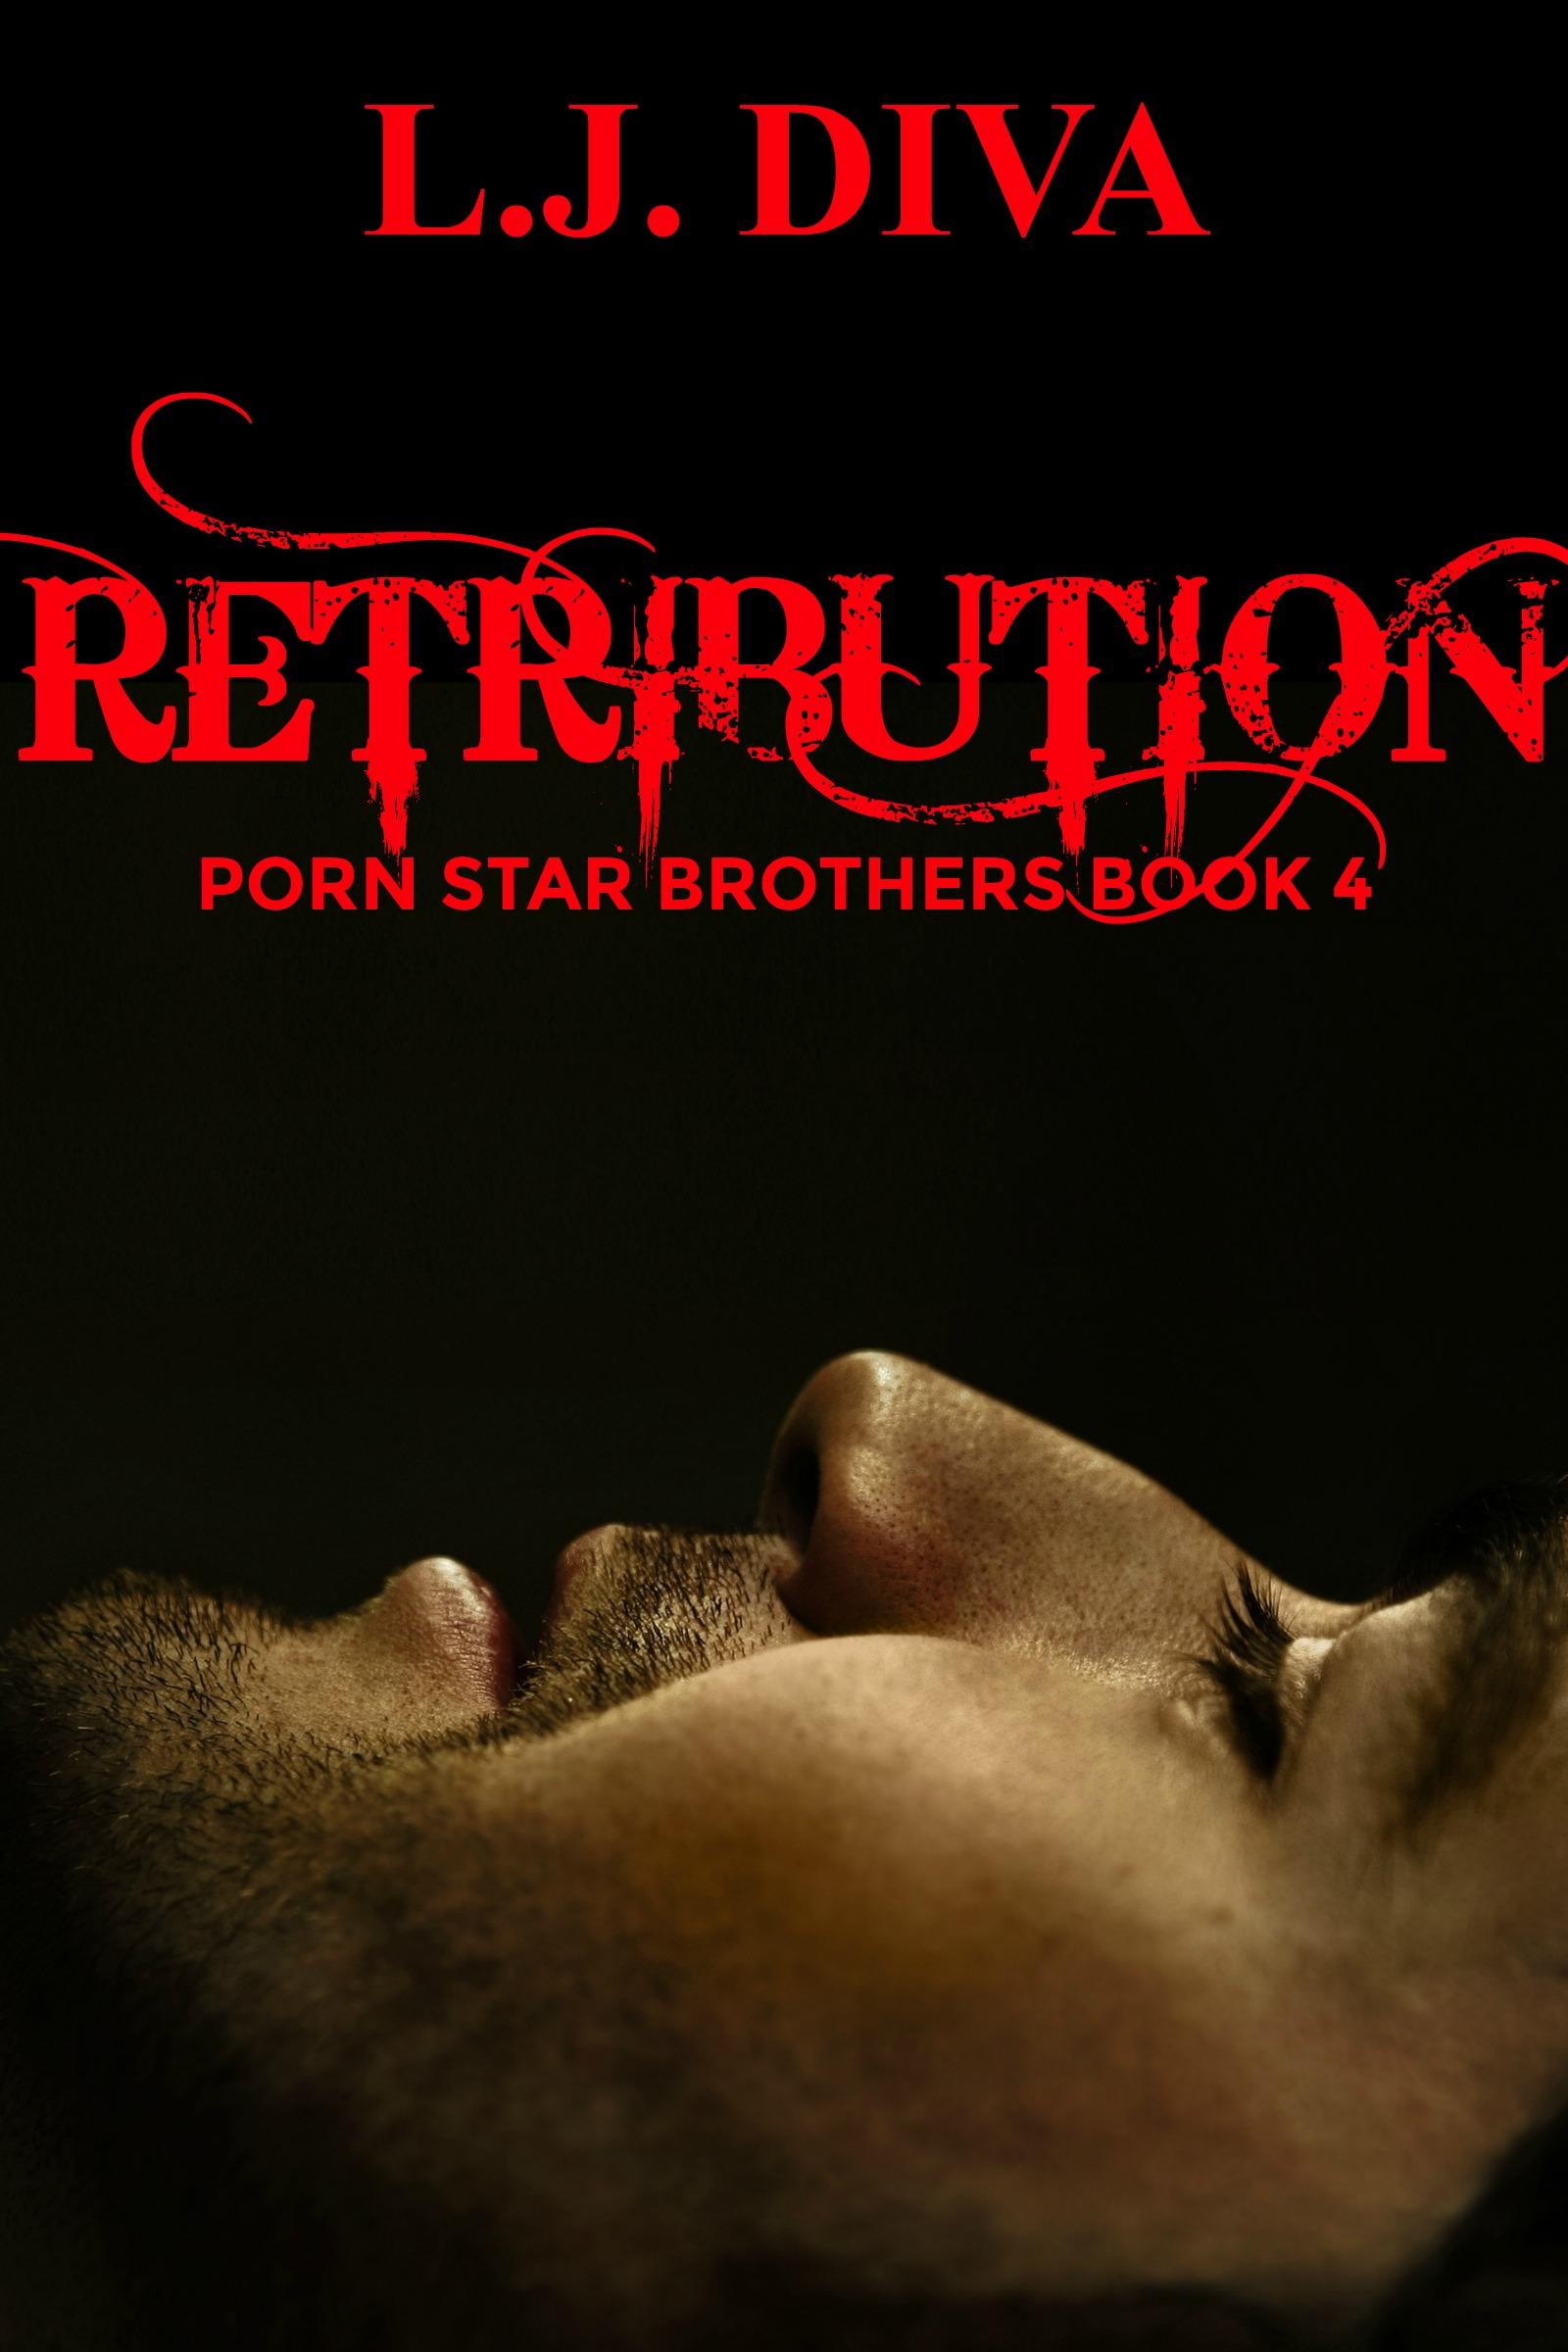 Retribution (Porn Star Brothers Book 4)